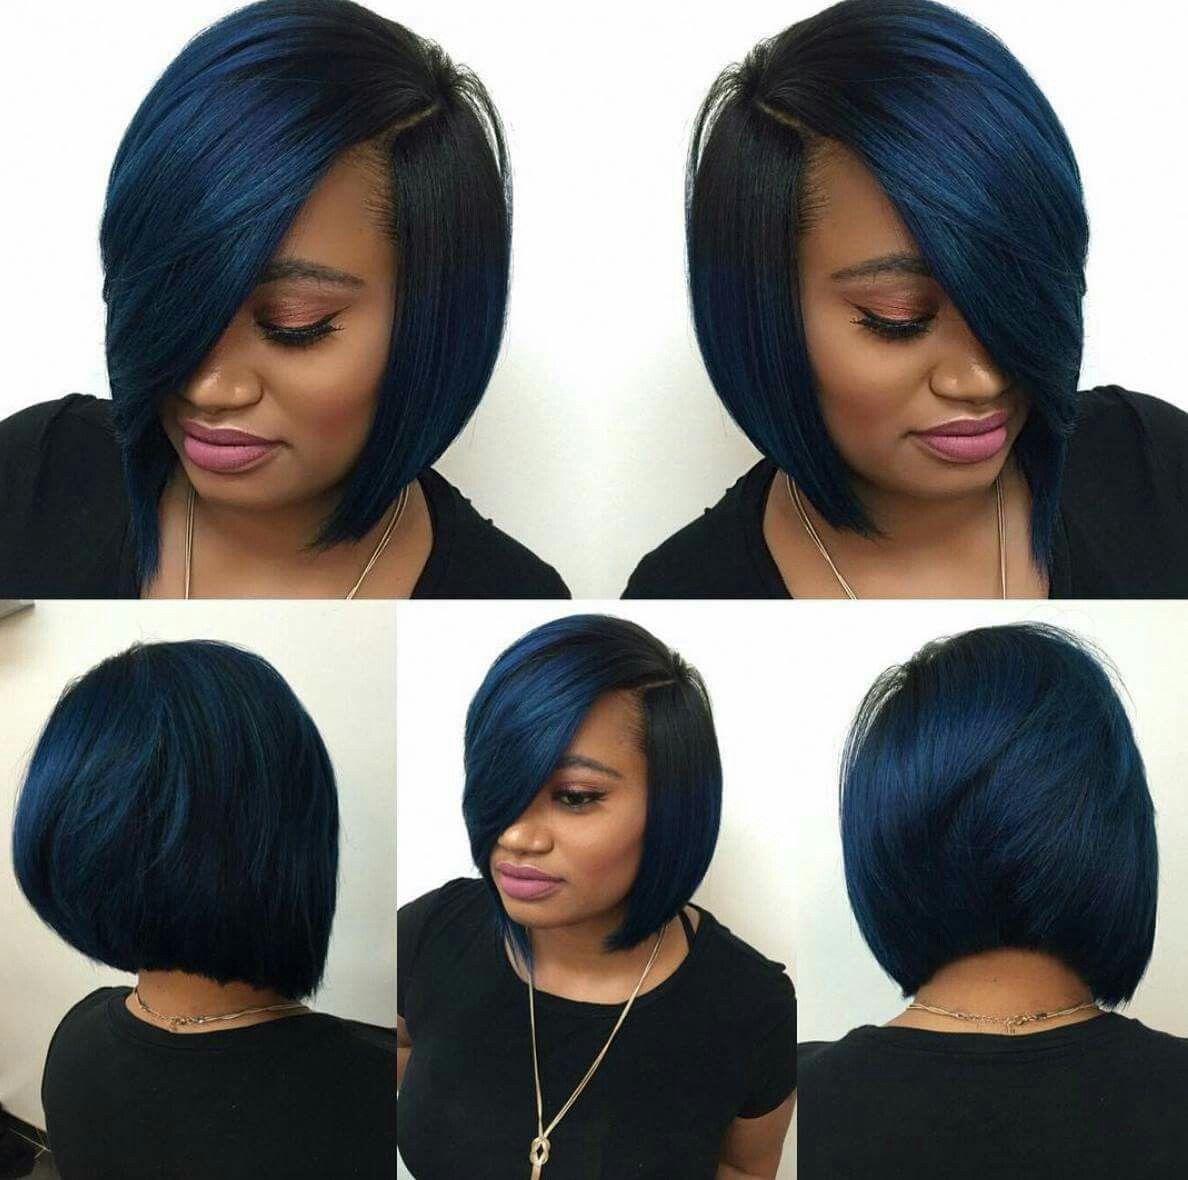 Blue Bob Short Hair Styles Hair Styles Bob Hairstyles